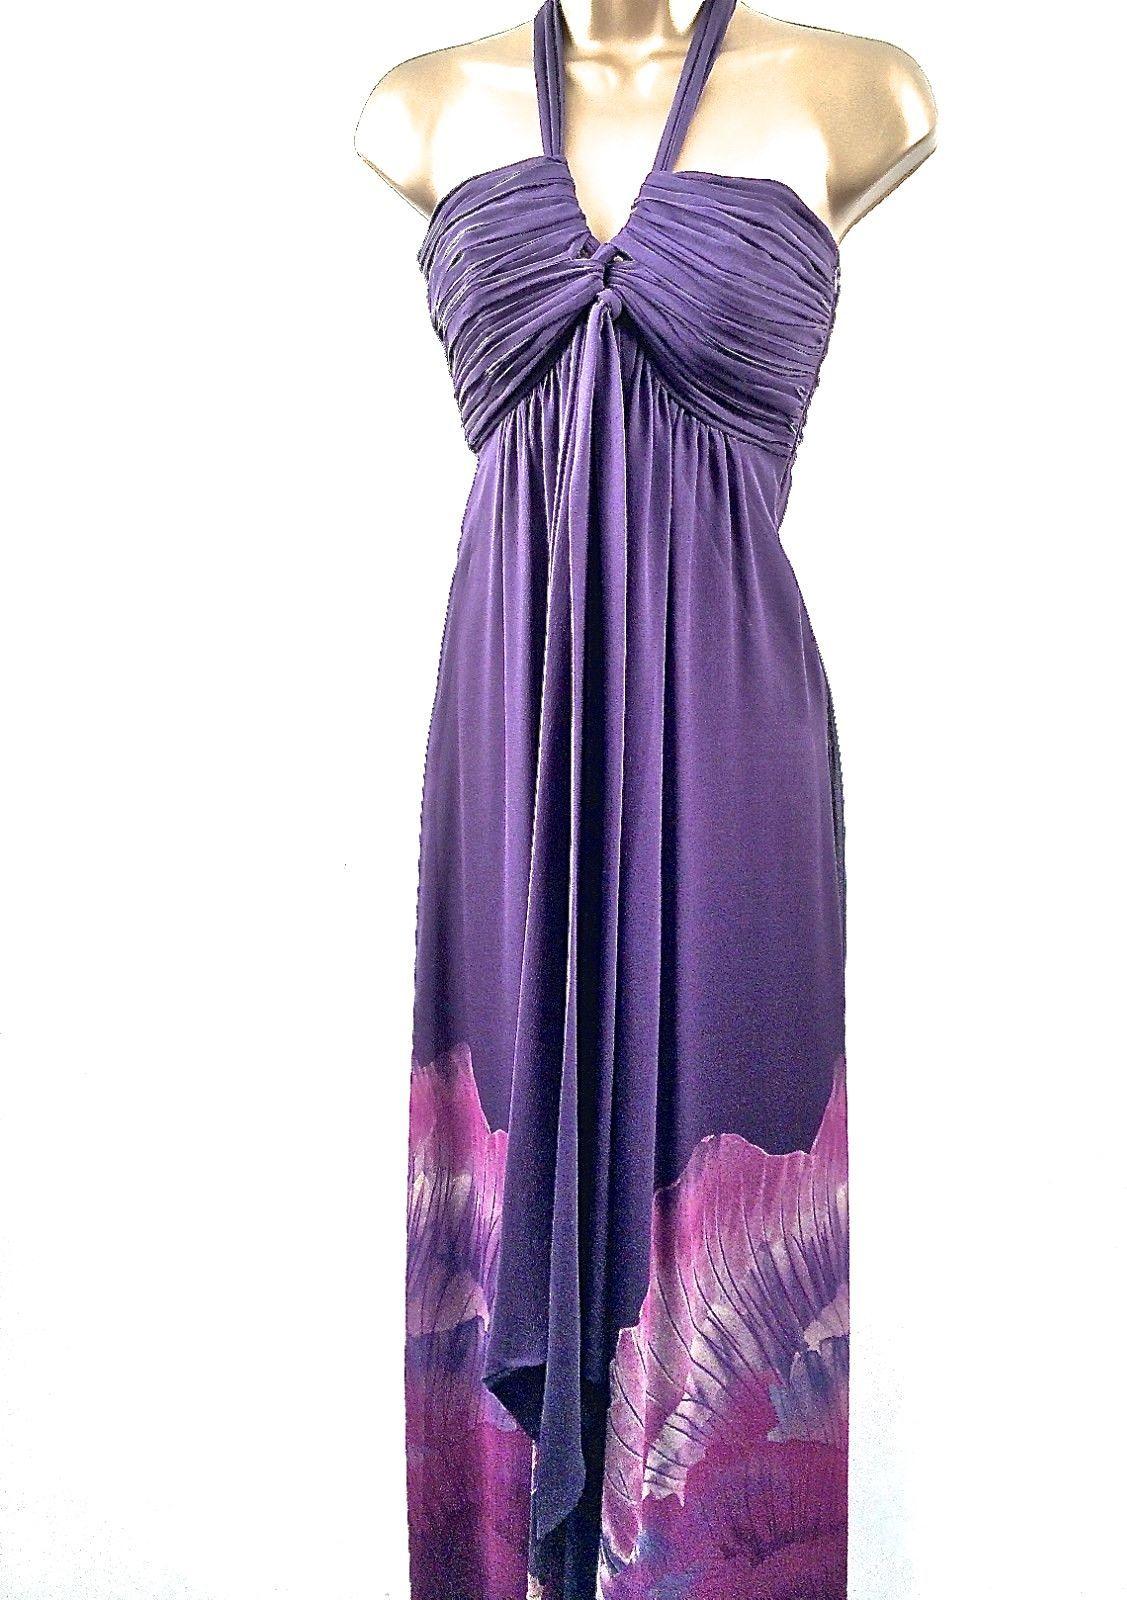 Karen Millen Dress Sizes 6 & 10 Purple Pink Silk DL193 Long Evening Ladies Maxi | eBay